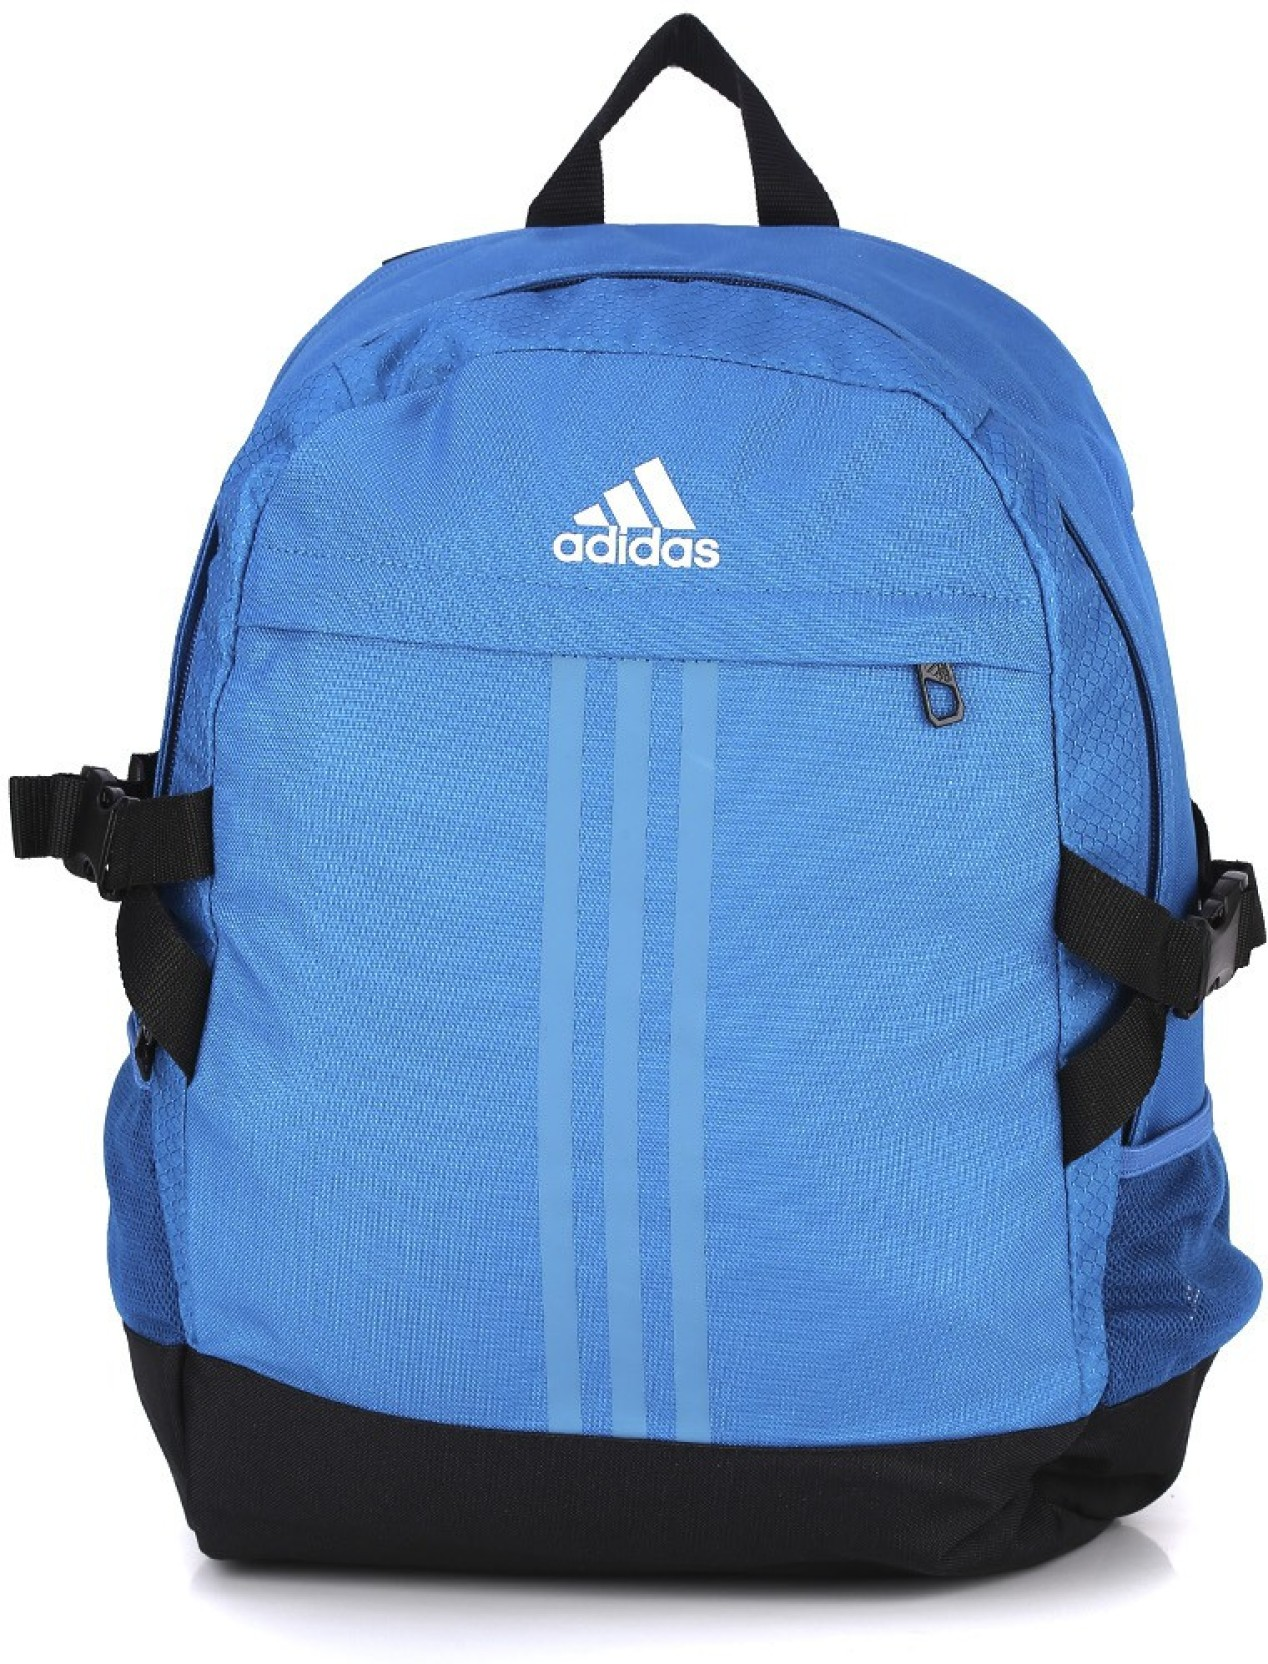 Adidas BP POWER III M 499 g Laptop Backpack Blue